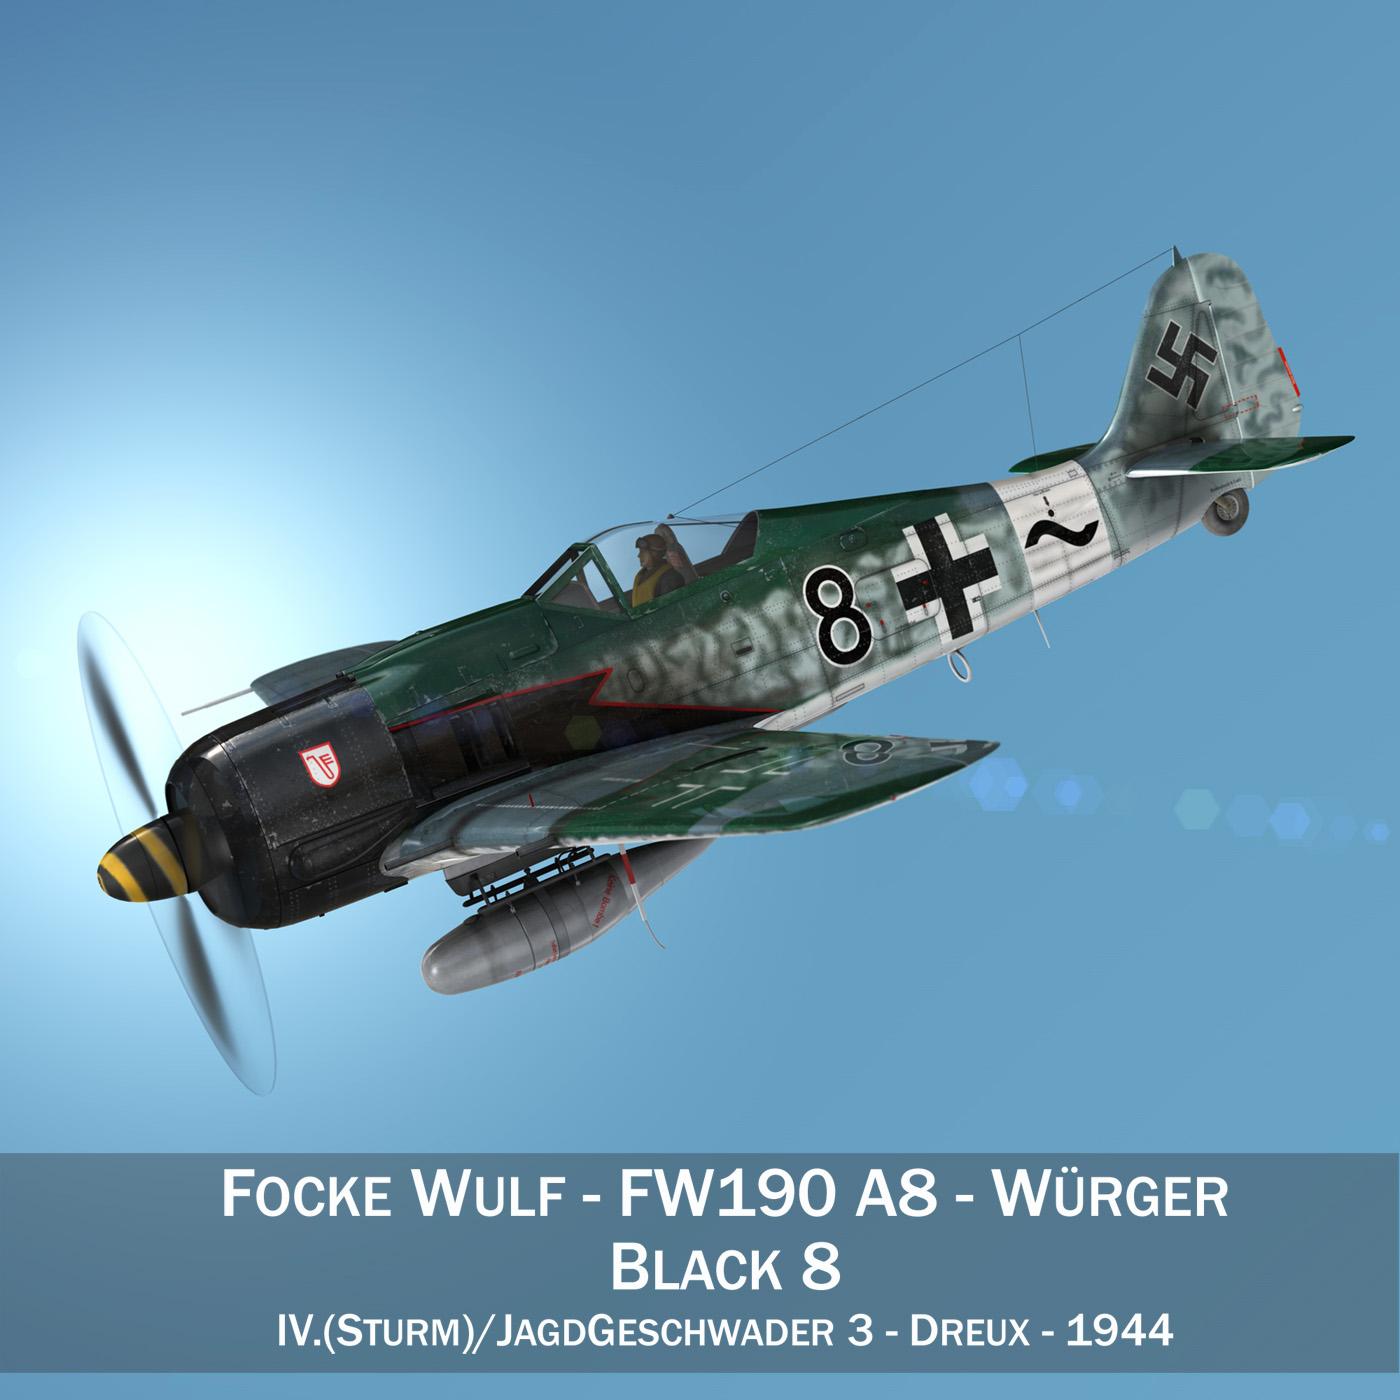 focke wulf – fw190 a8 – black 8 3d model 3ds c4d fbx lwo lw lws obj 266051